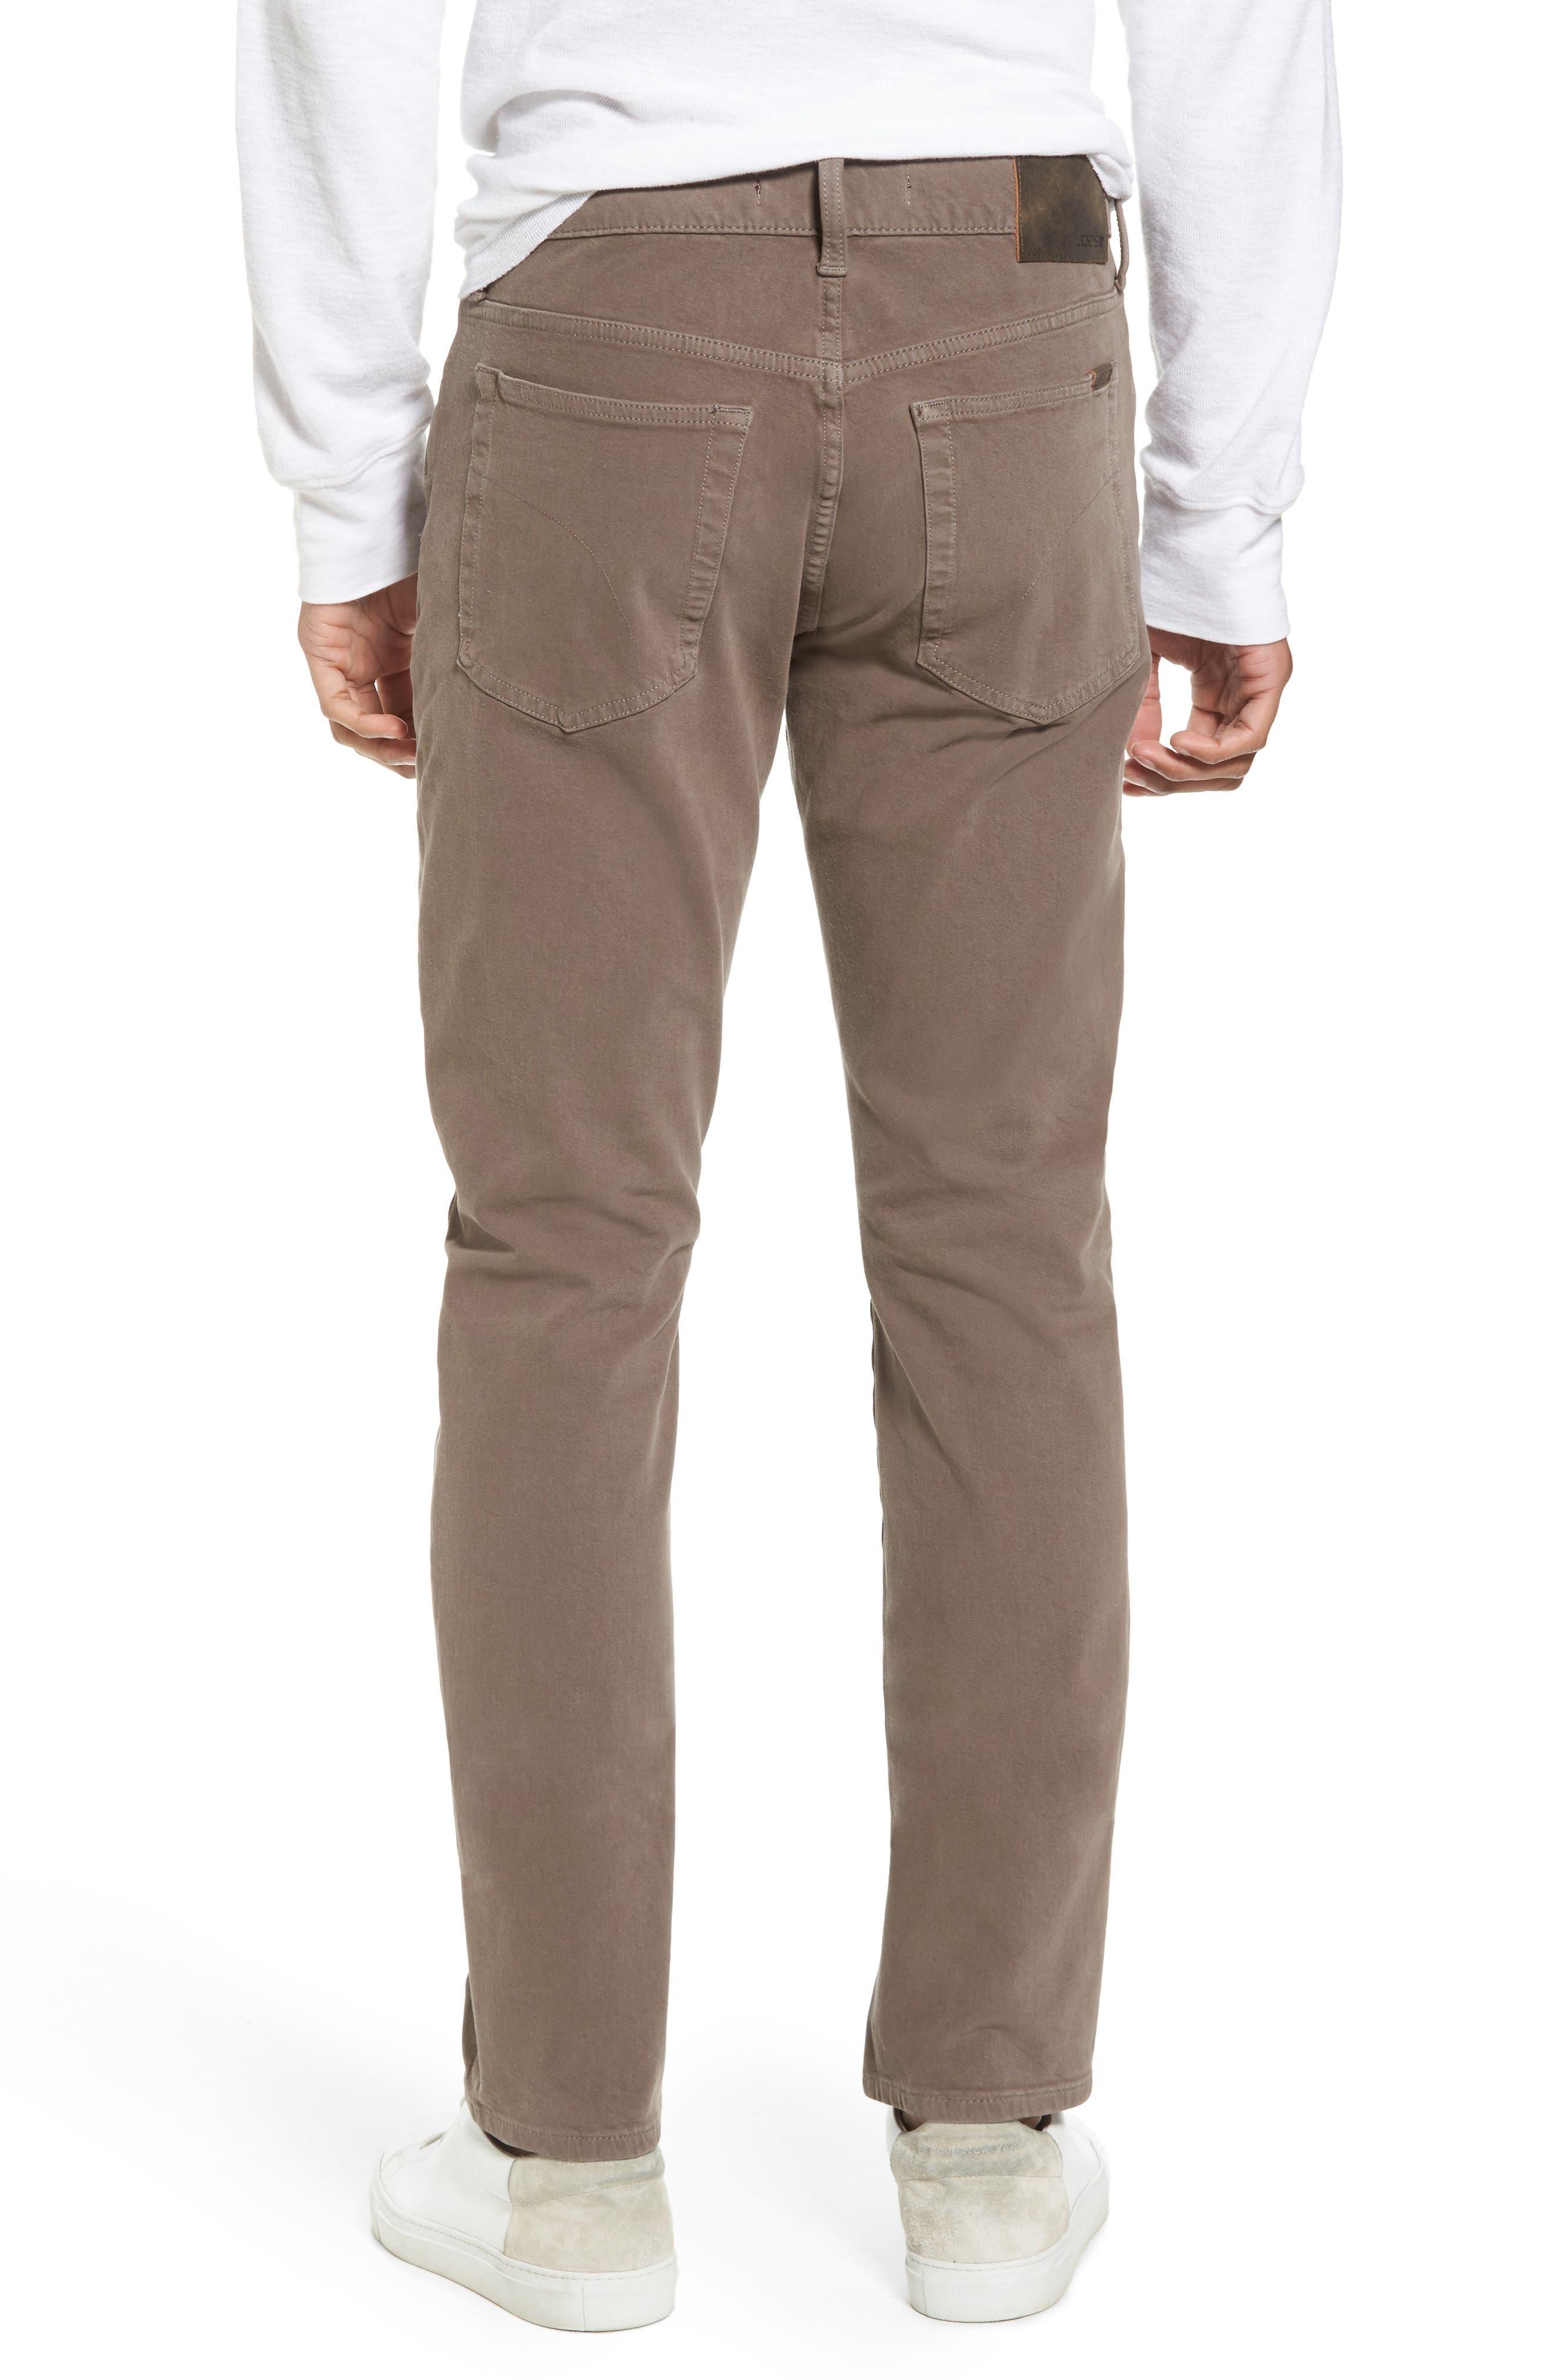 Kinetic Slim Fit Jeans,                             Alternate thumbnail 2, color,                             Stonehenge